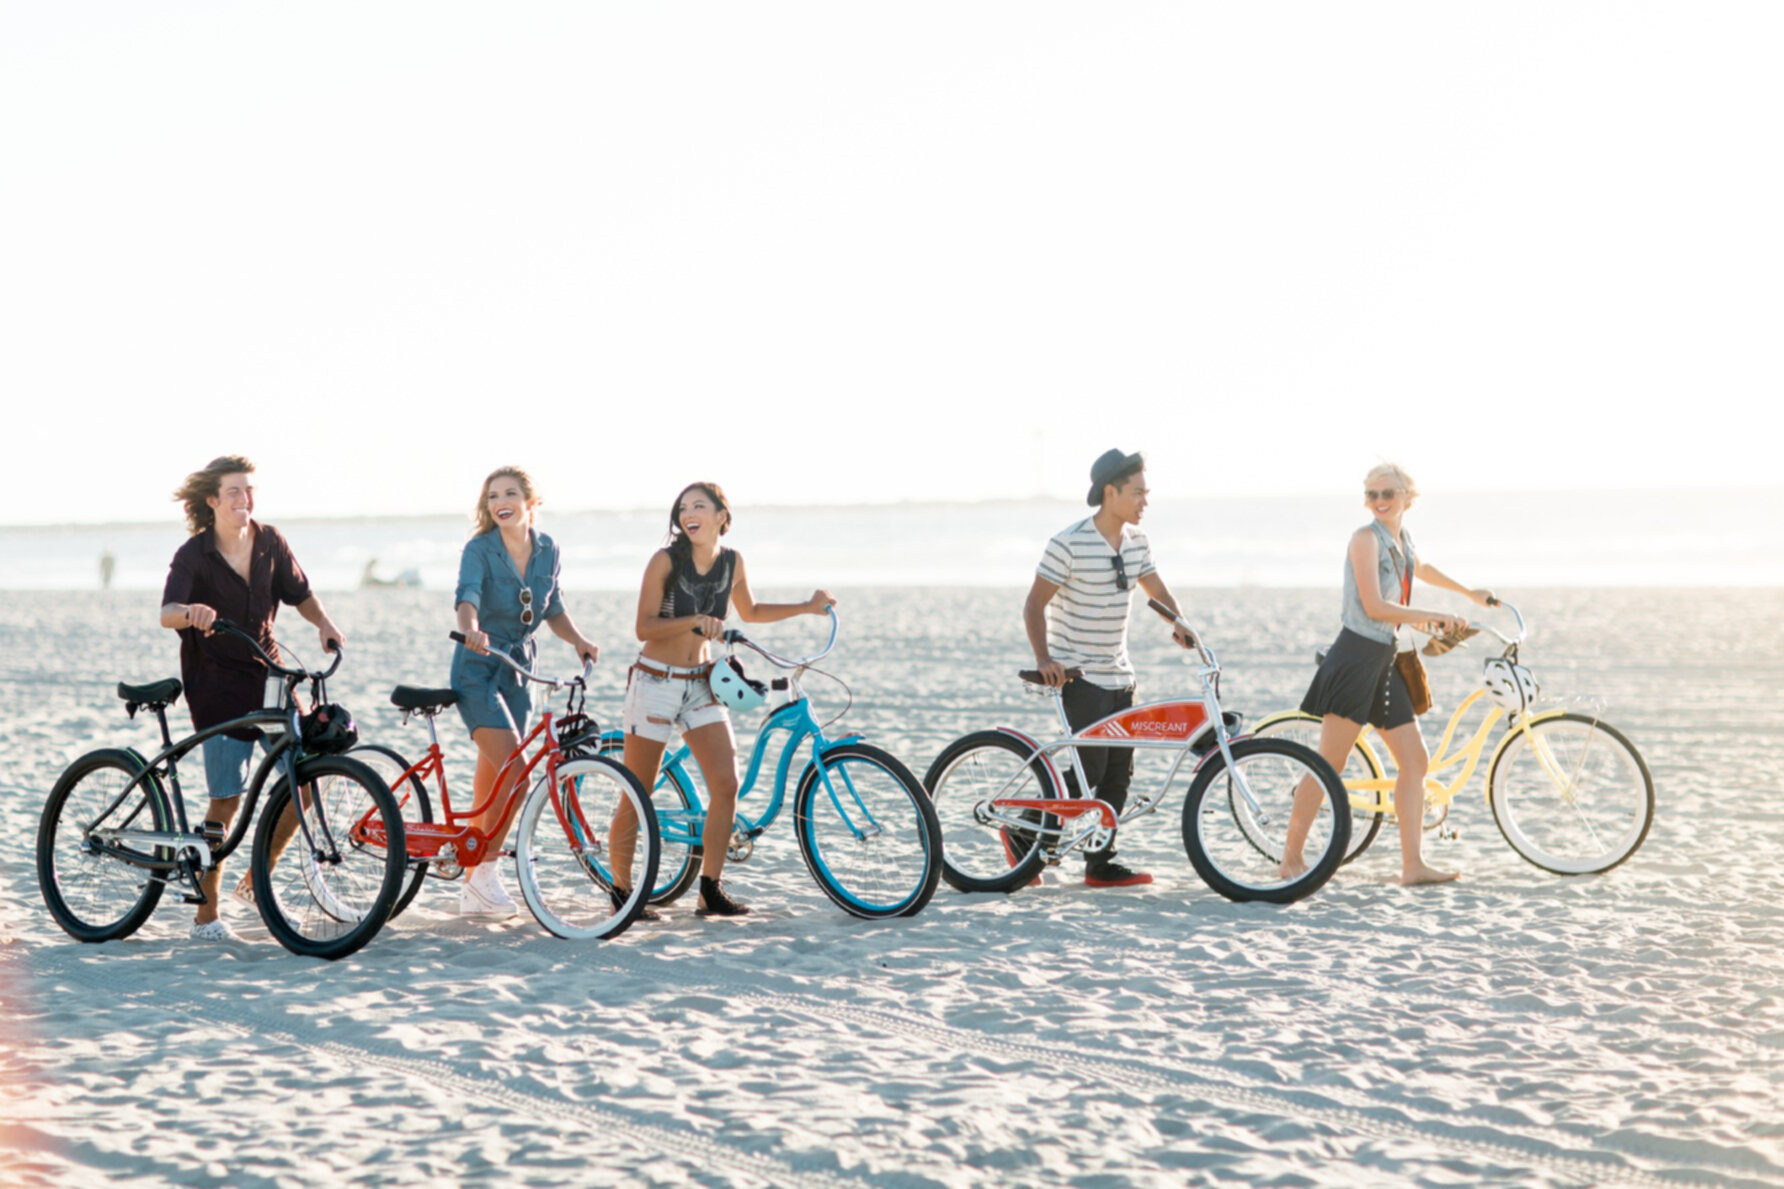 Bicycle four mile beach.jpg